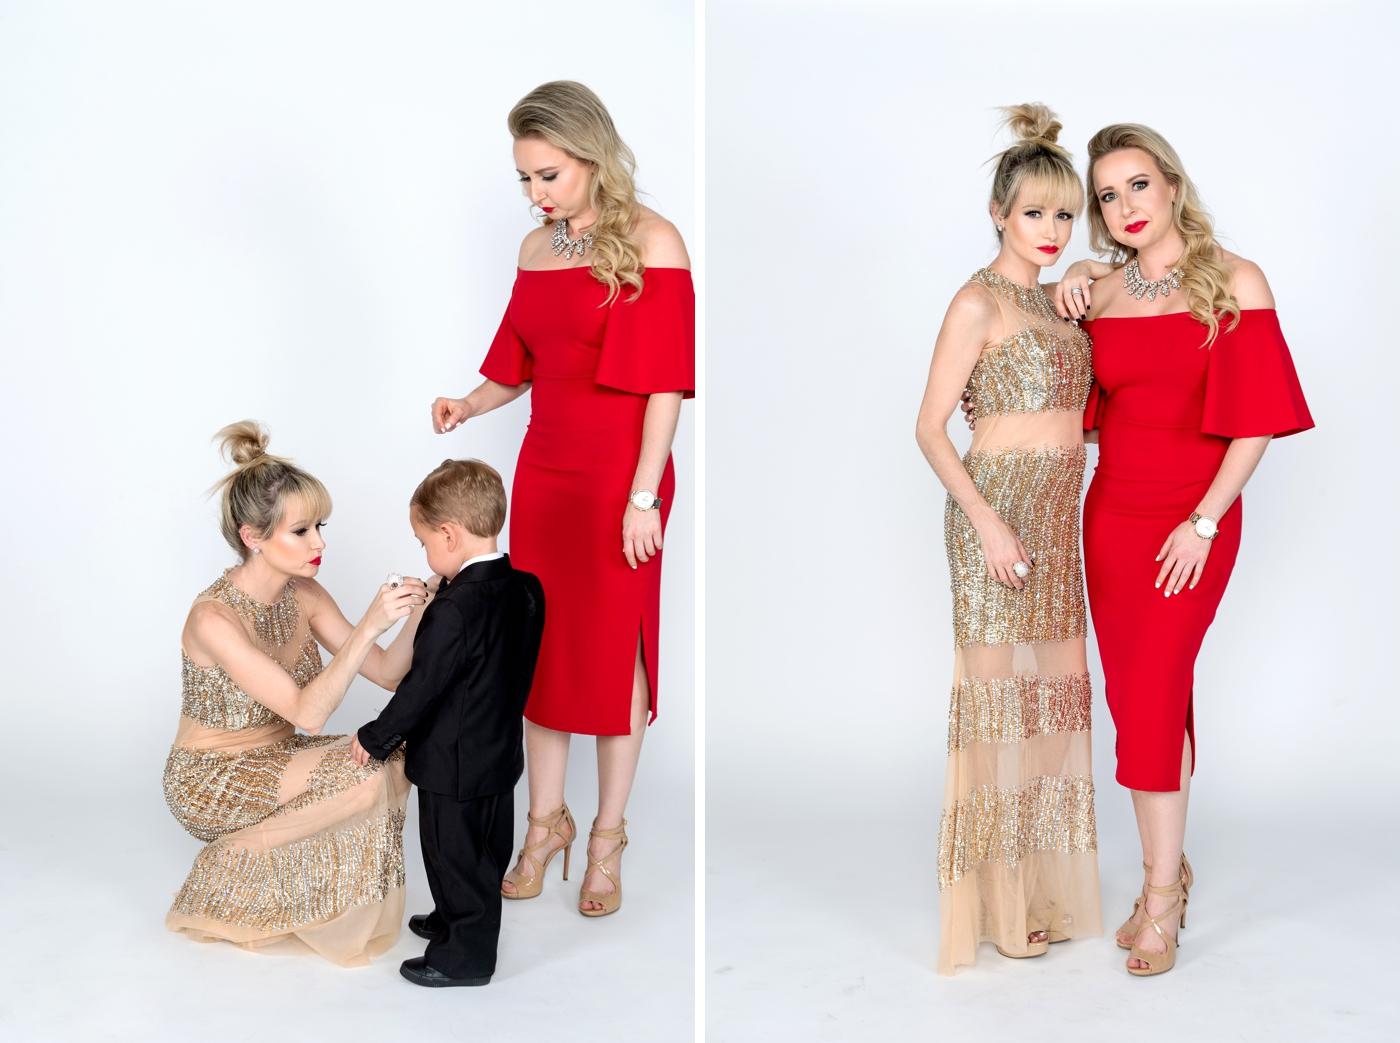 Glamorous family portraits